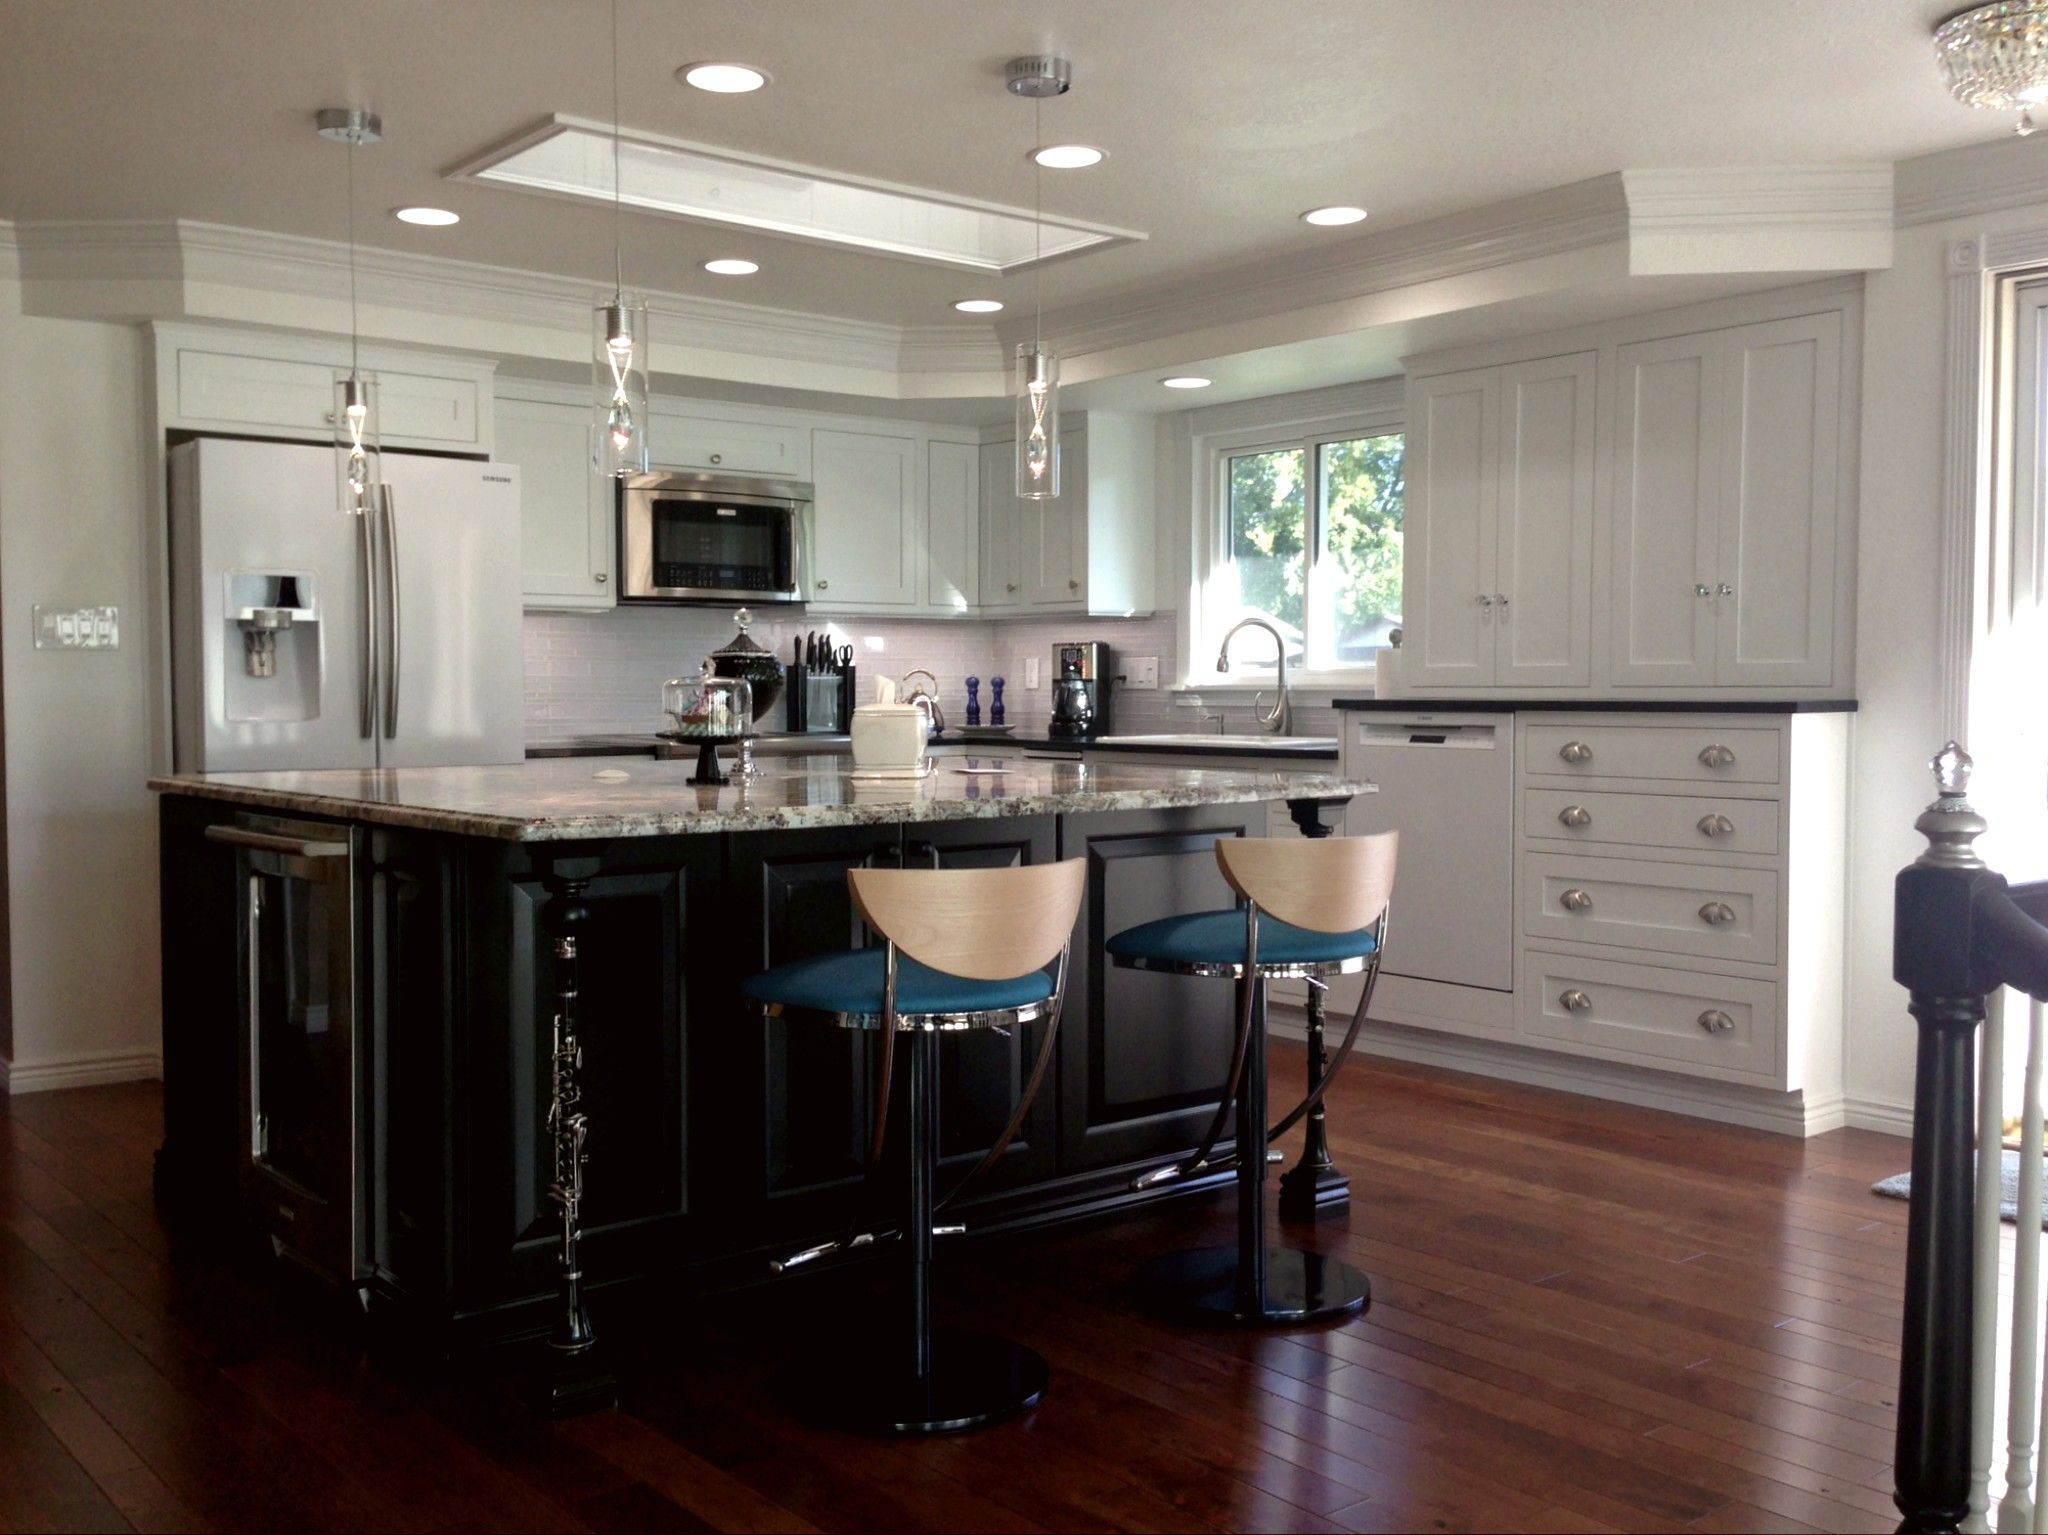 BKC Kitchen and Bath Denver kitchen remodel - Perimeter cabinets ...